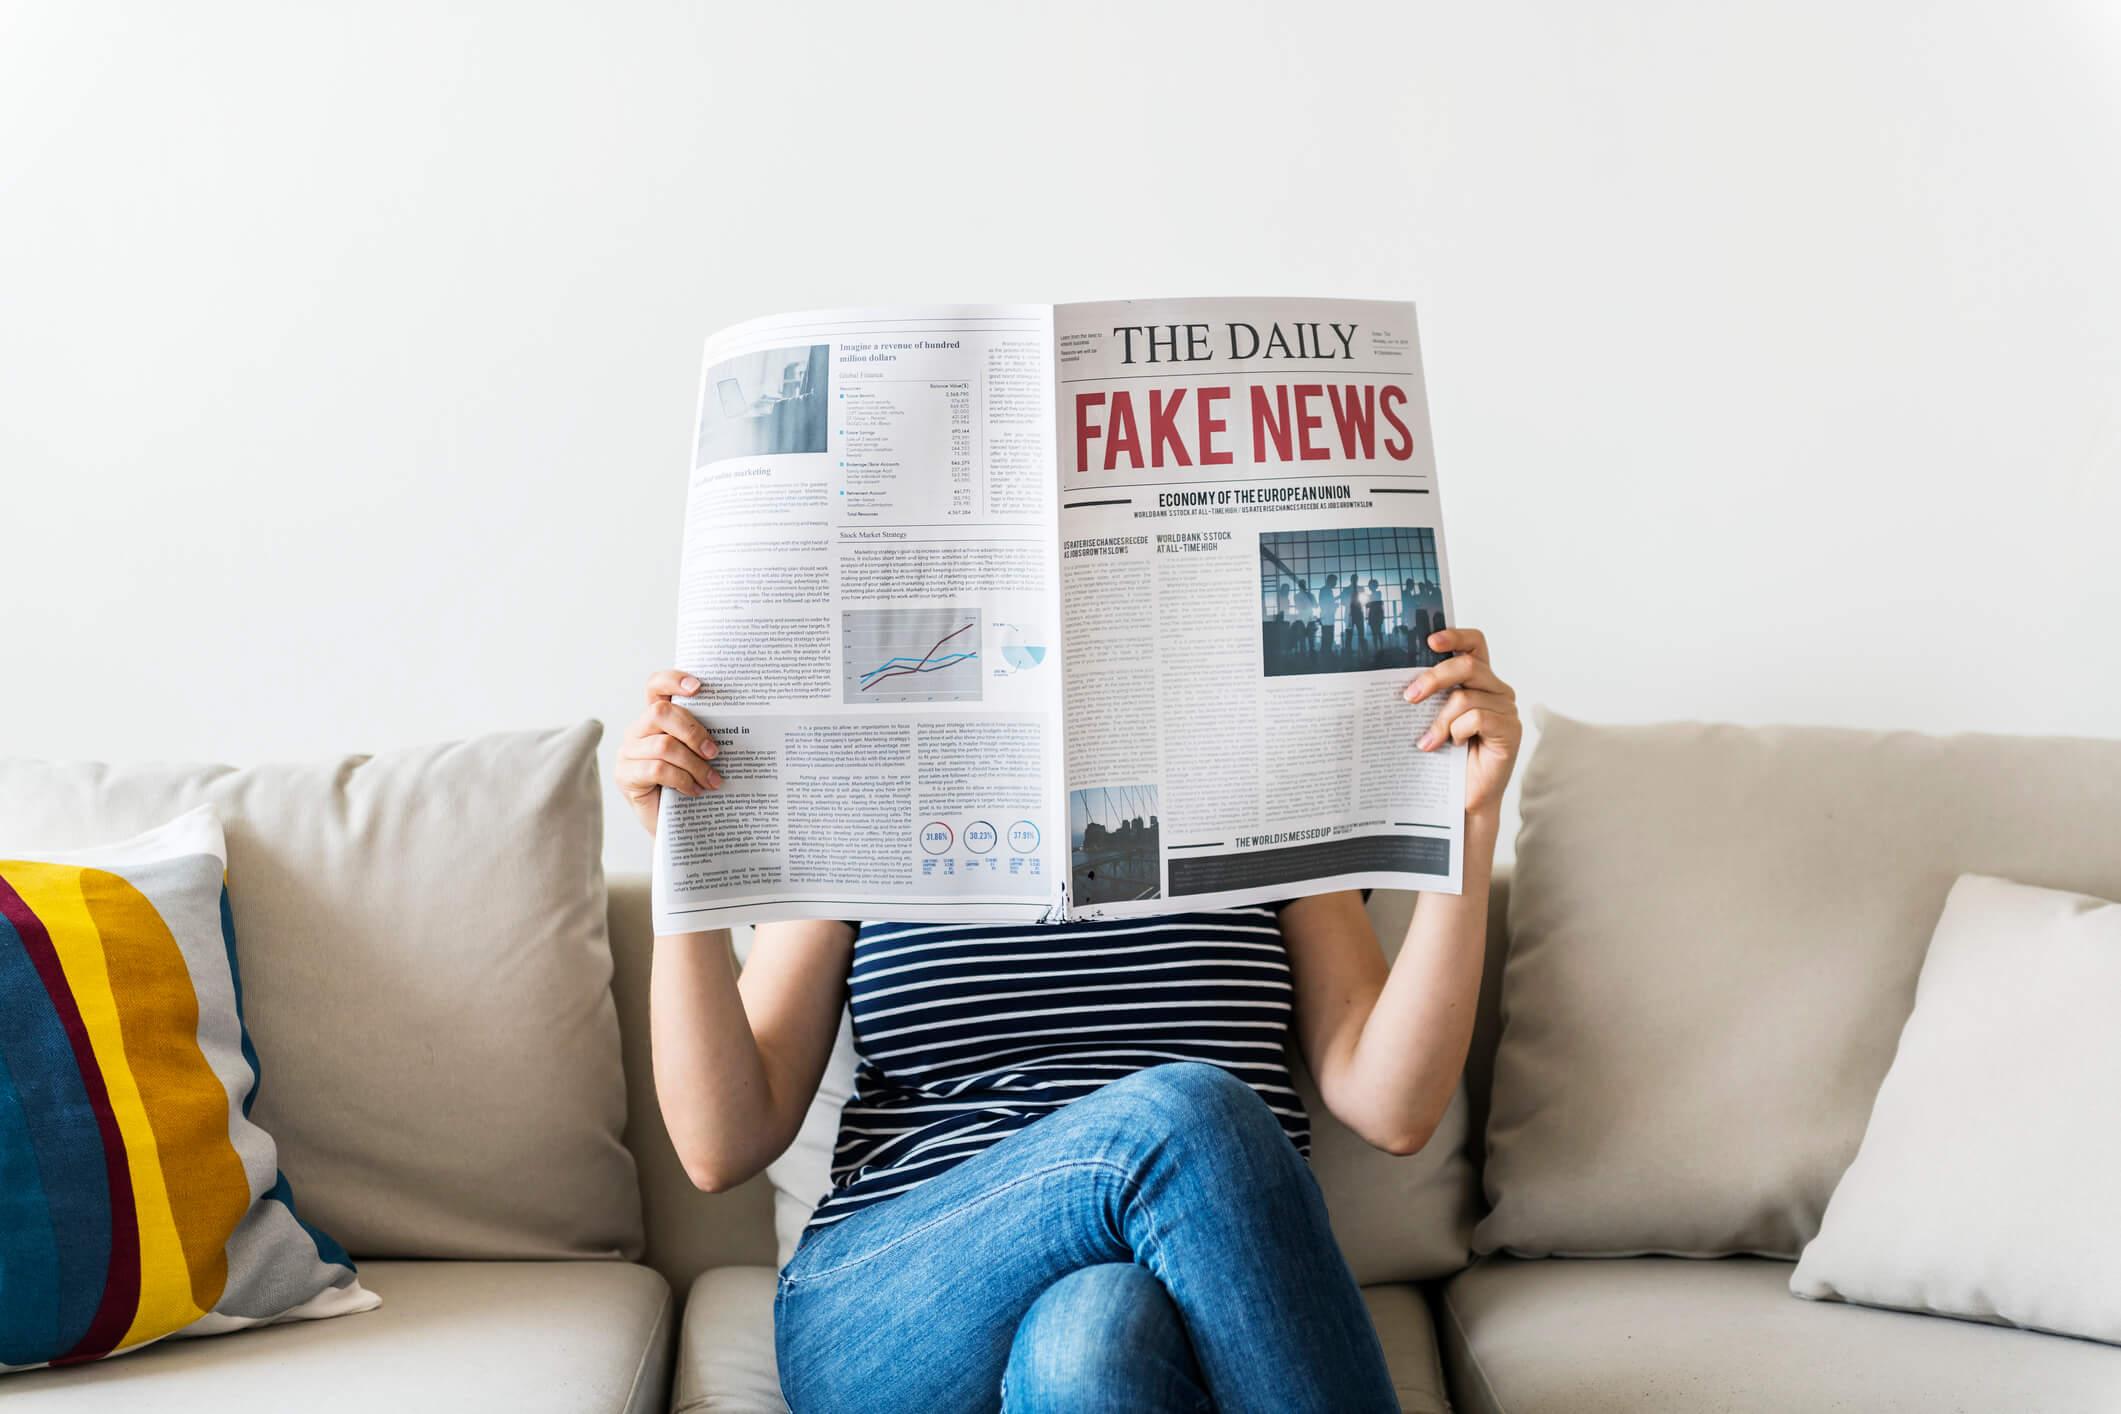 Fact or Fake News?